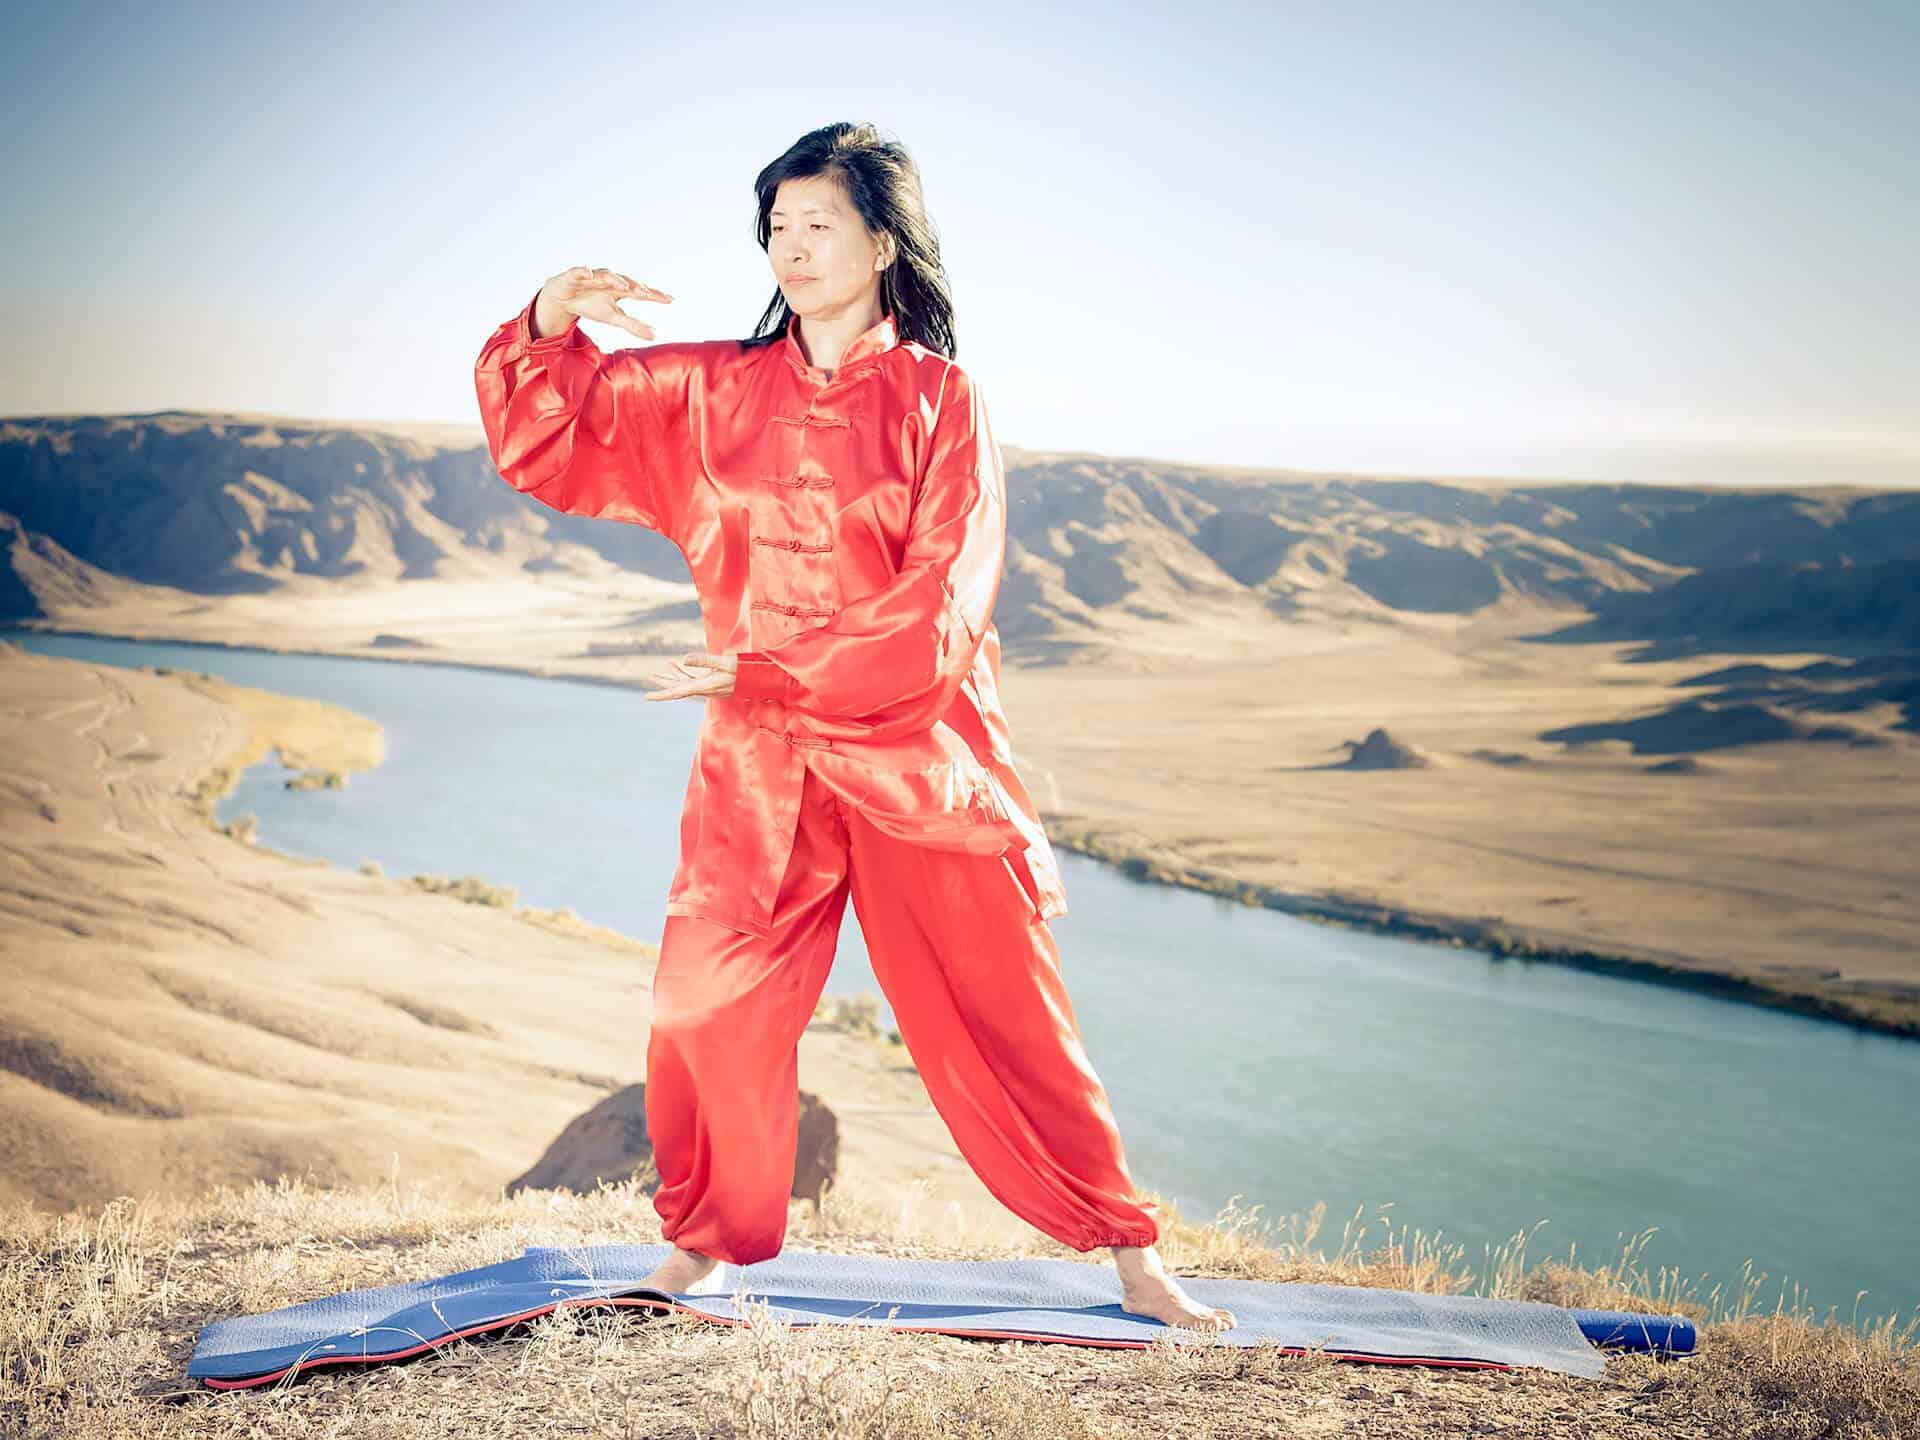 Scopri il Qi Gong e la Medicina Cinese - Karate Jitsu